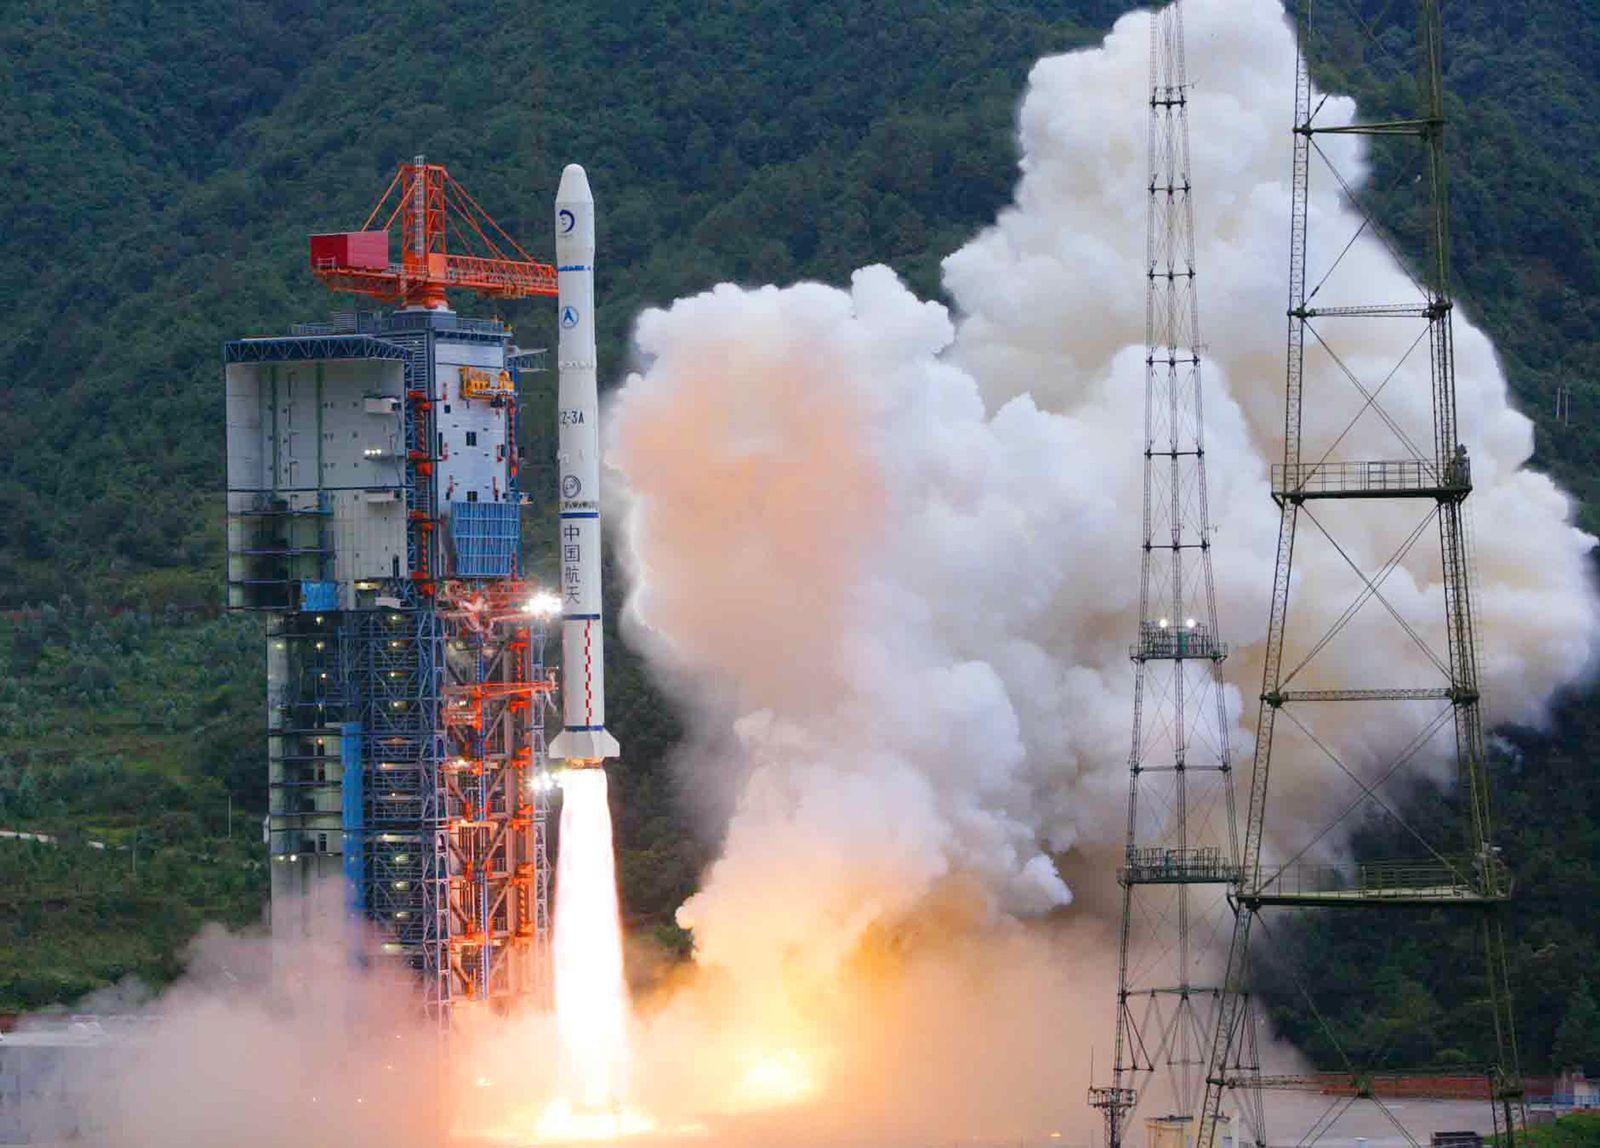 Chang'e 1 / Raumfahrt / China